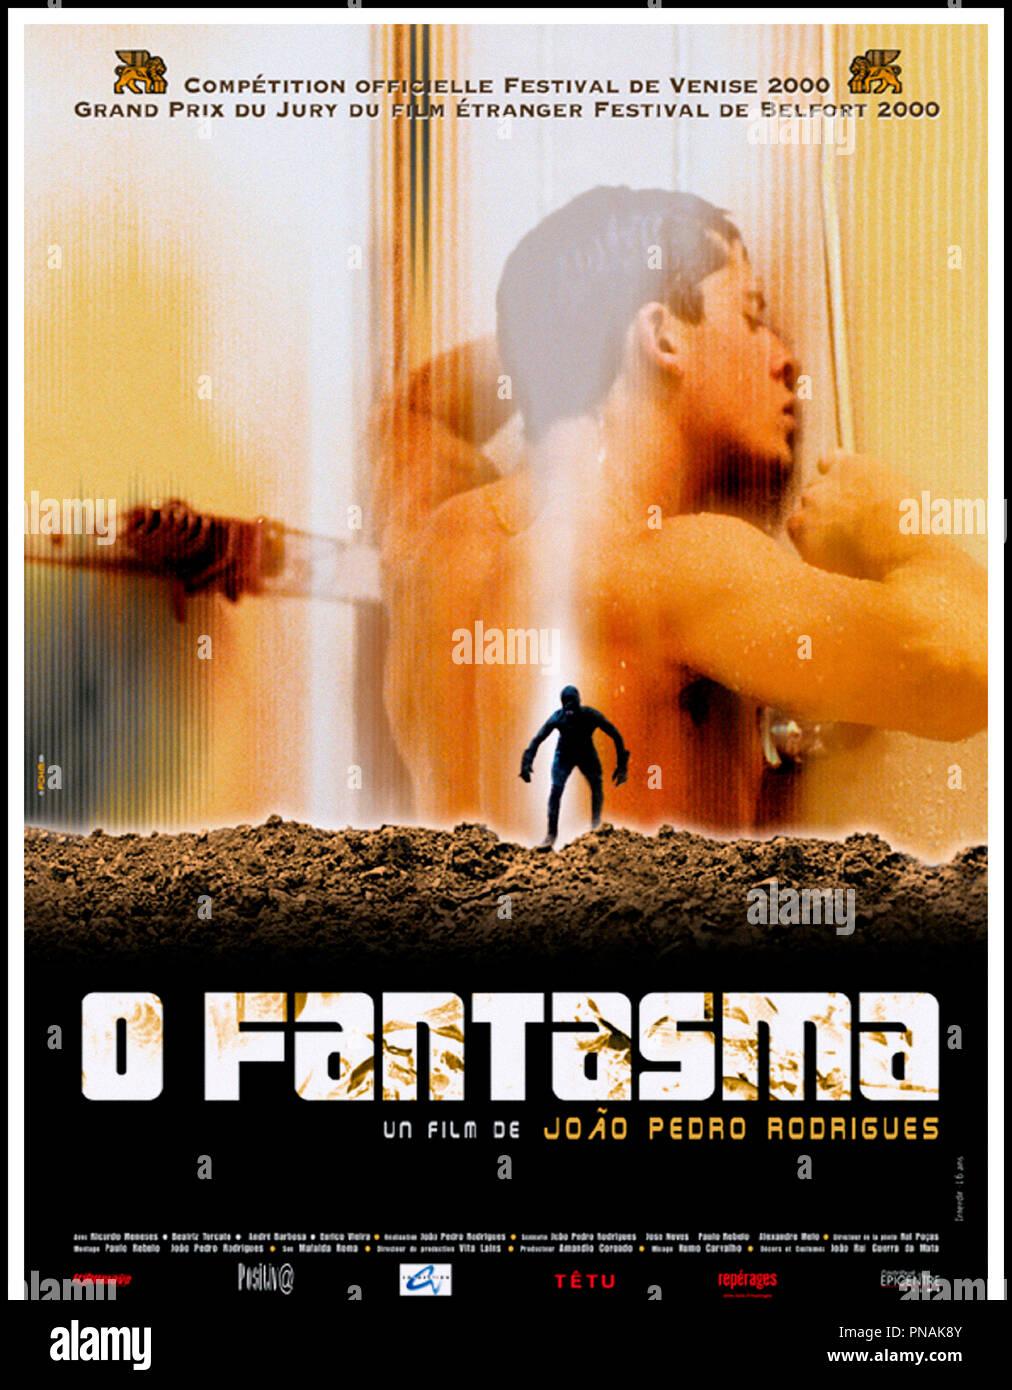 Prod DB © ICAM - RTP - Rosa Filmes / DR O fantasma (O FANTASMA) de João Pedro Rodrigues 2000 porta. Affiche française autre titre : Le fantasme Immagini Stock